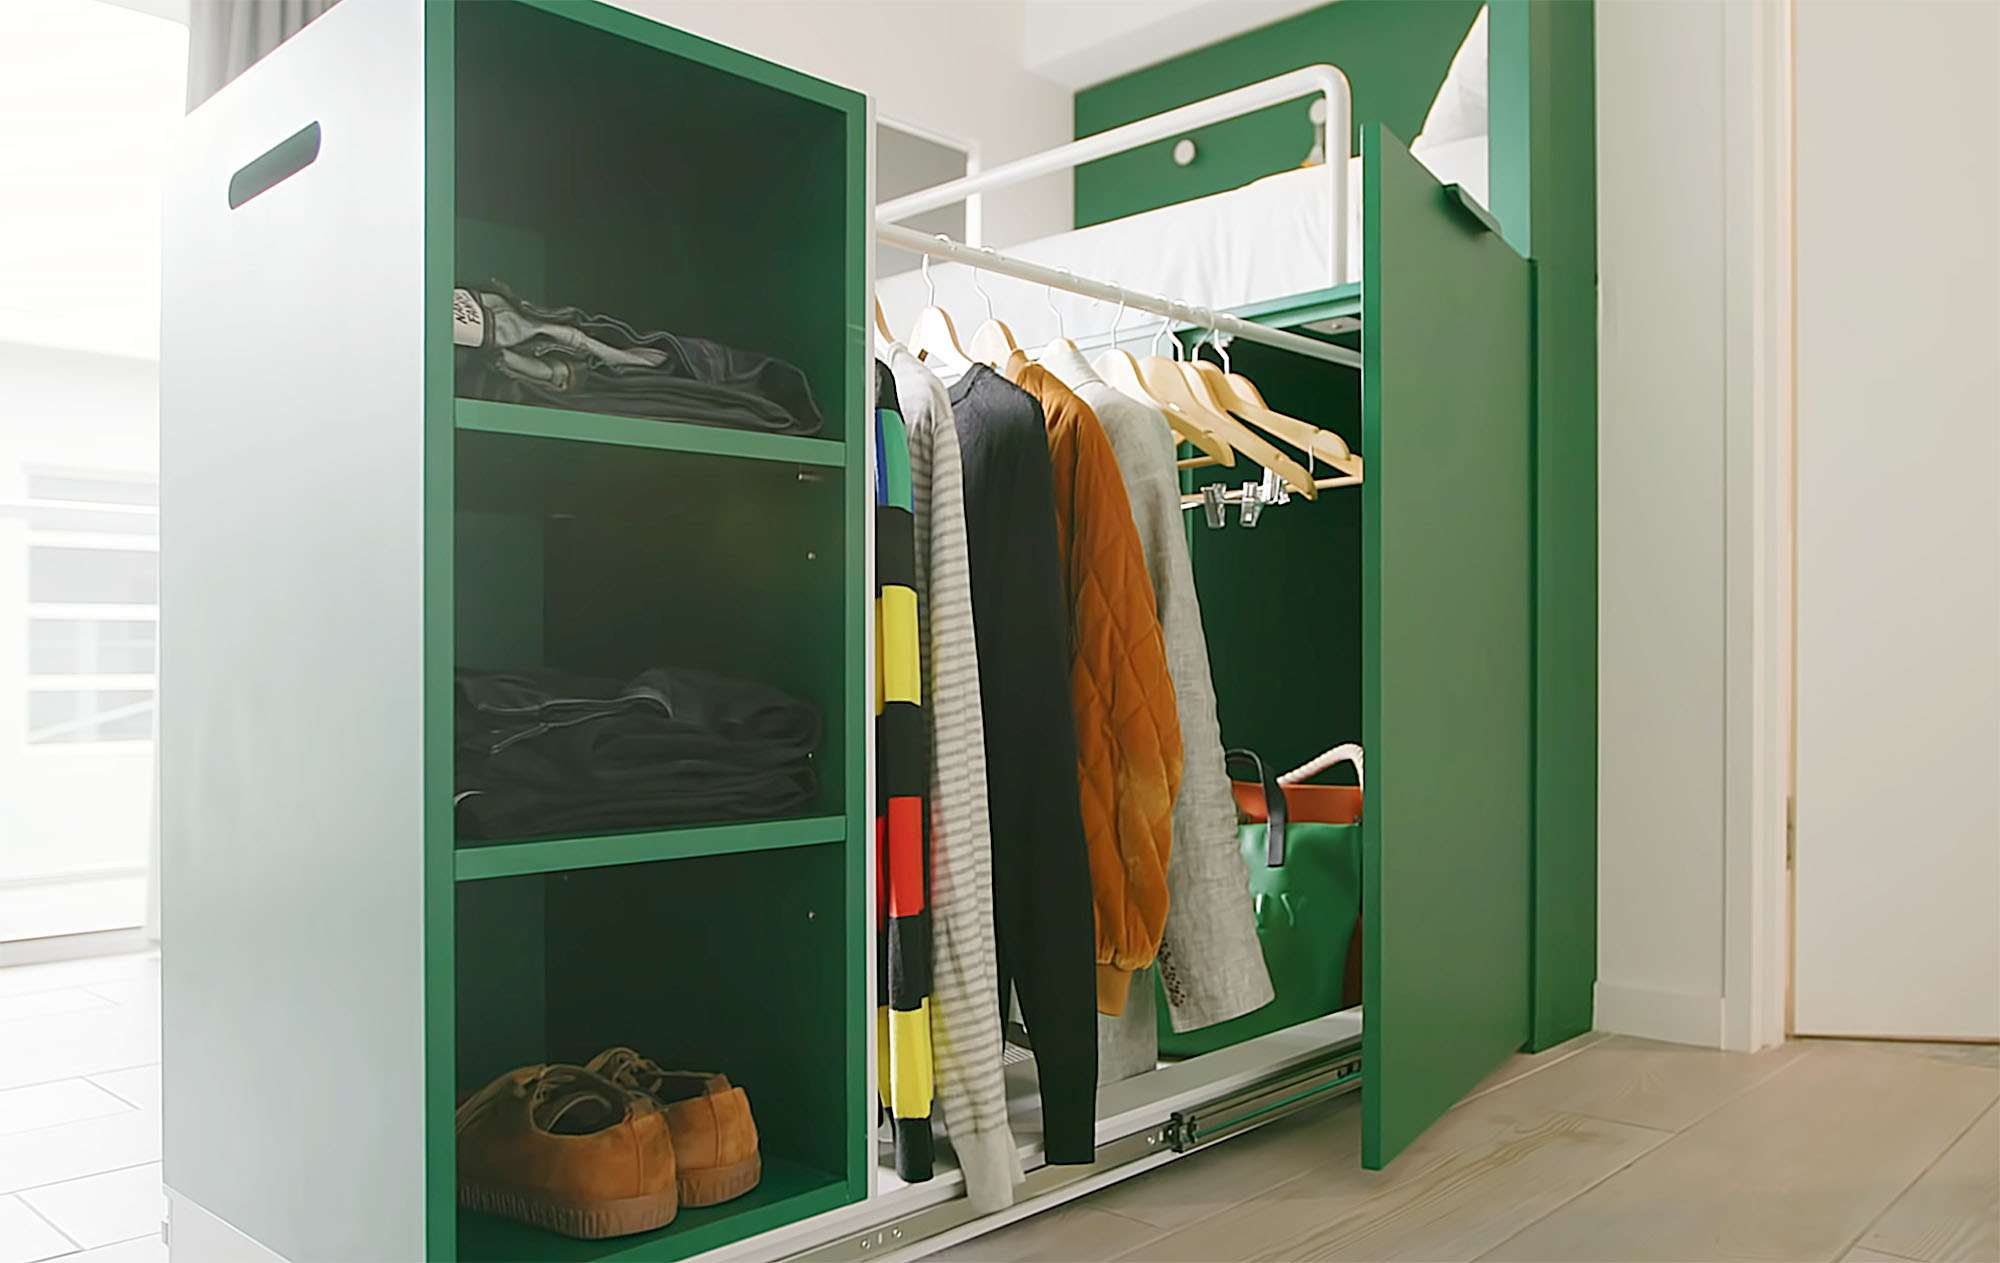 UKO stanmore coliving micro-apartment Mostaghim Associates wardrobe